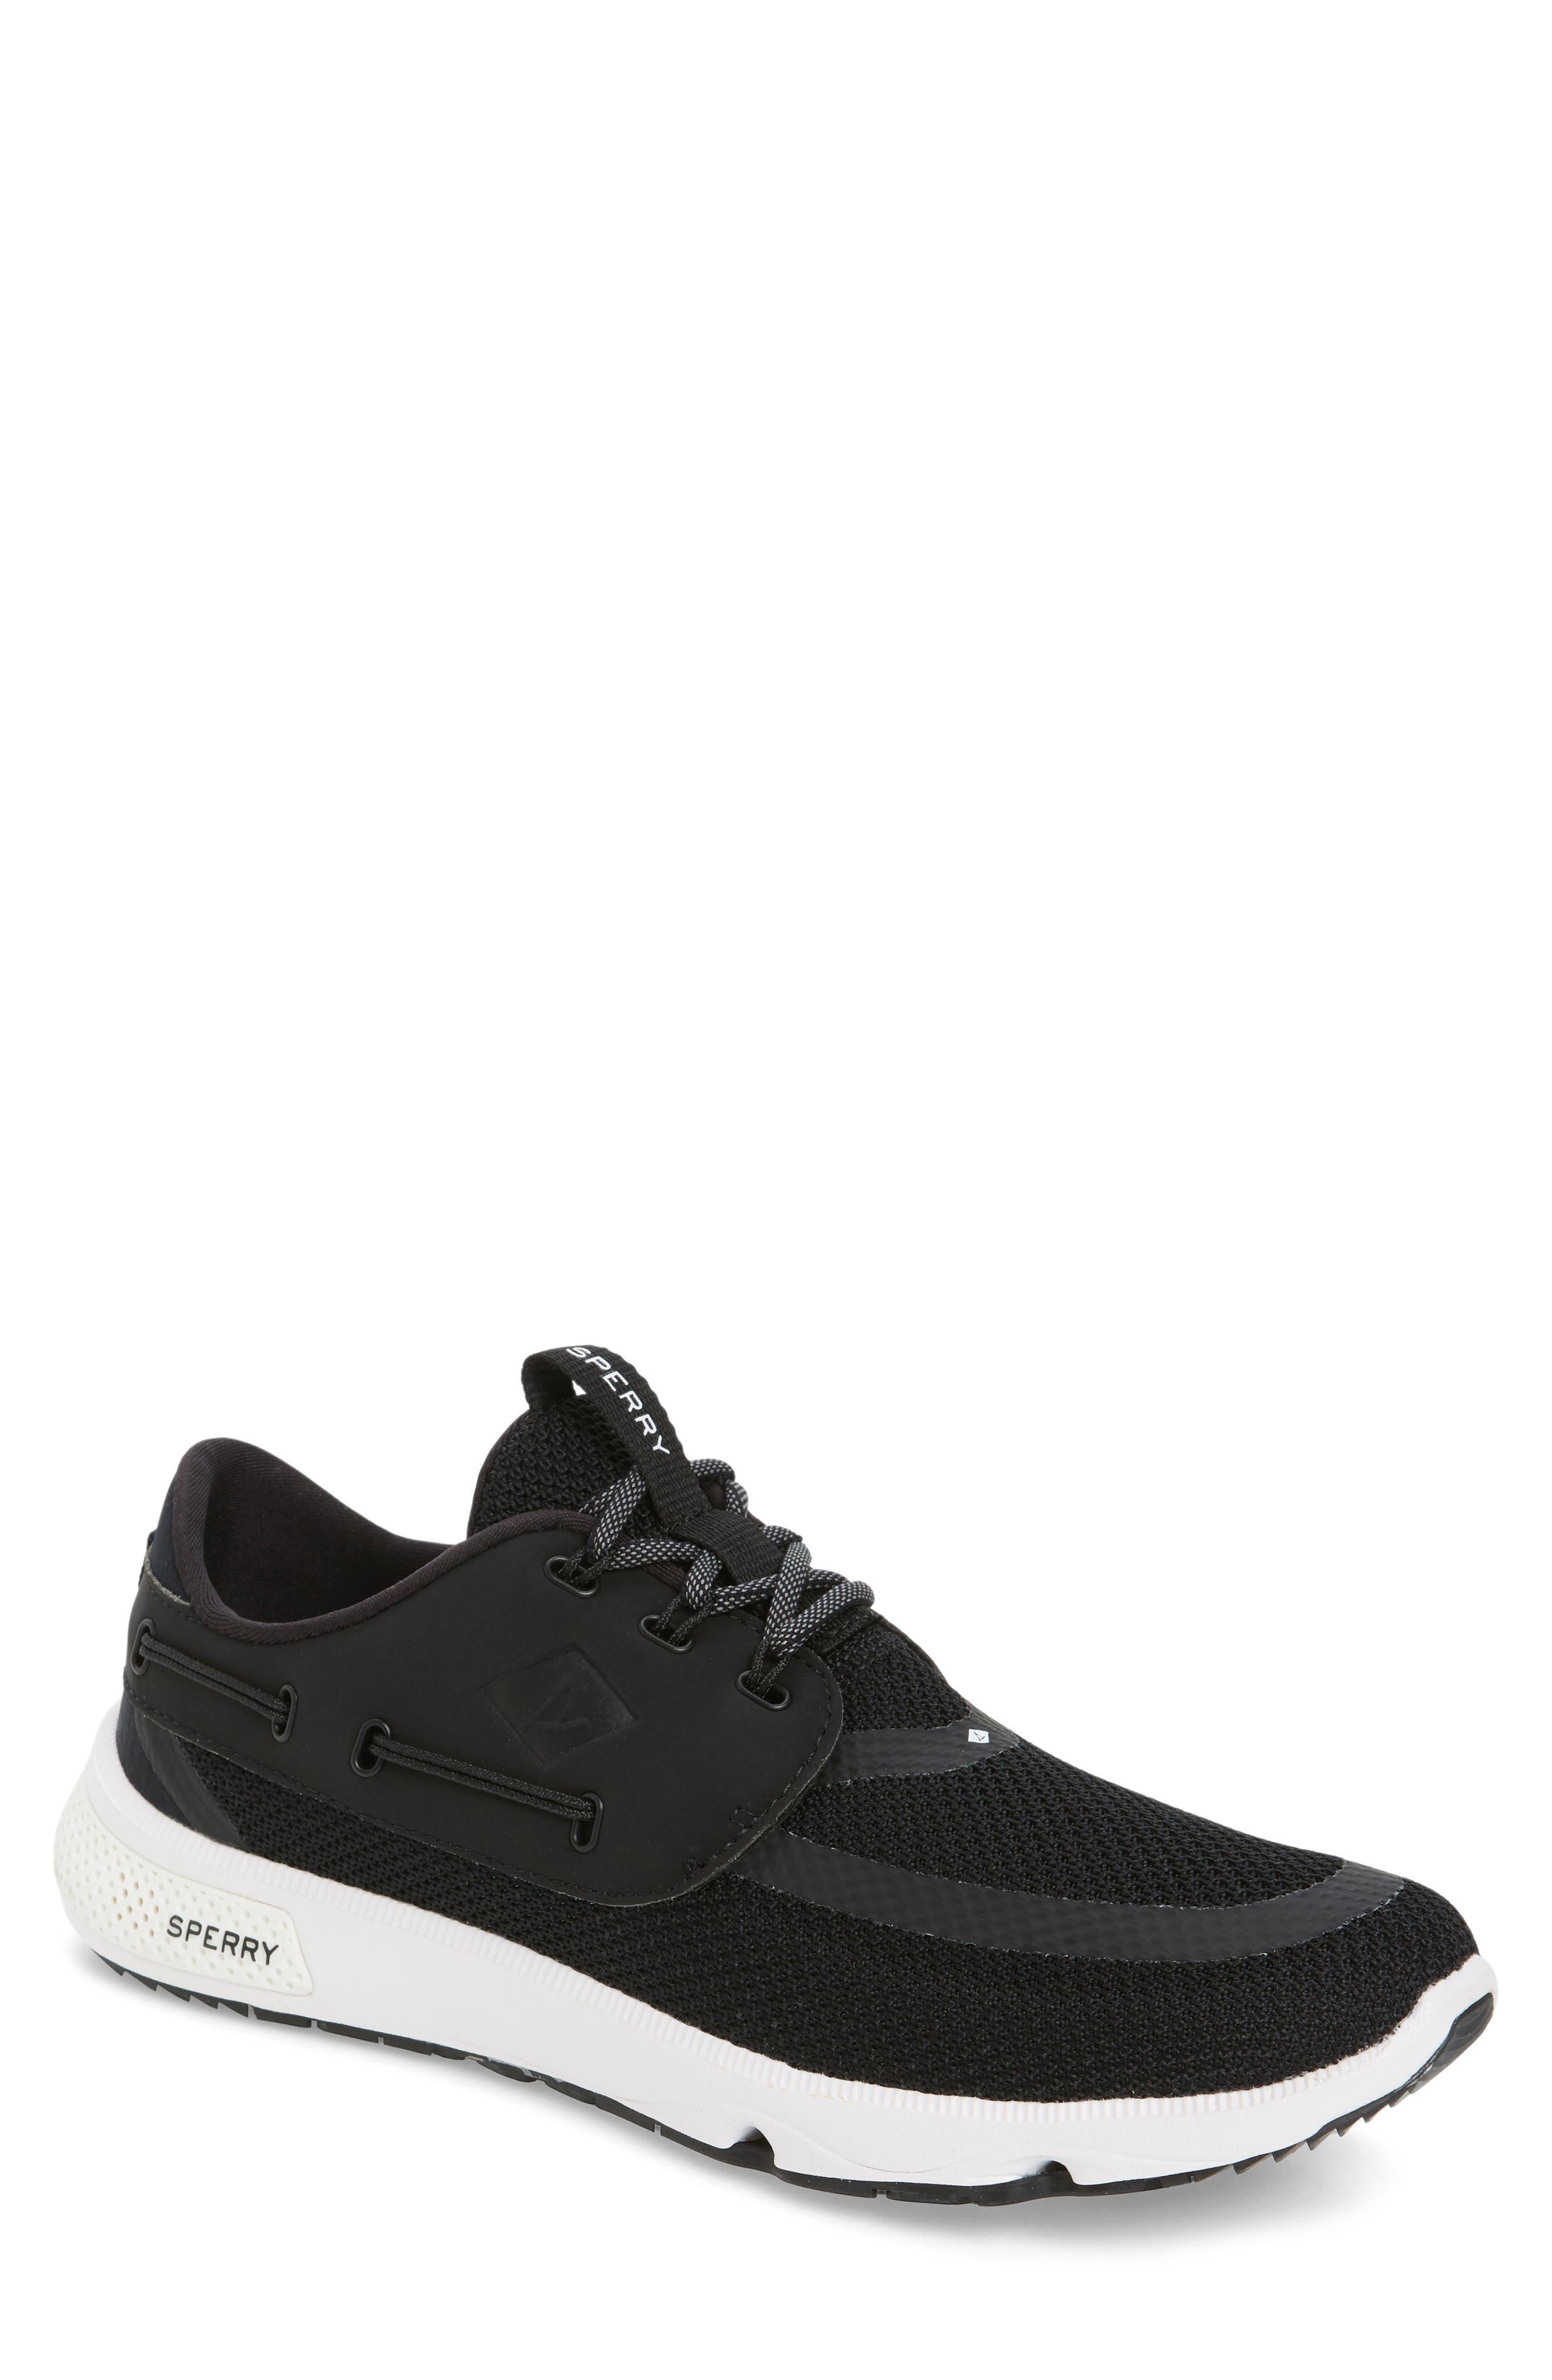 SPERRY 7 Seas Sneaker